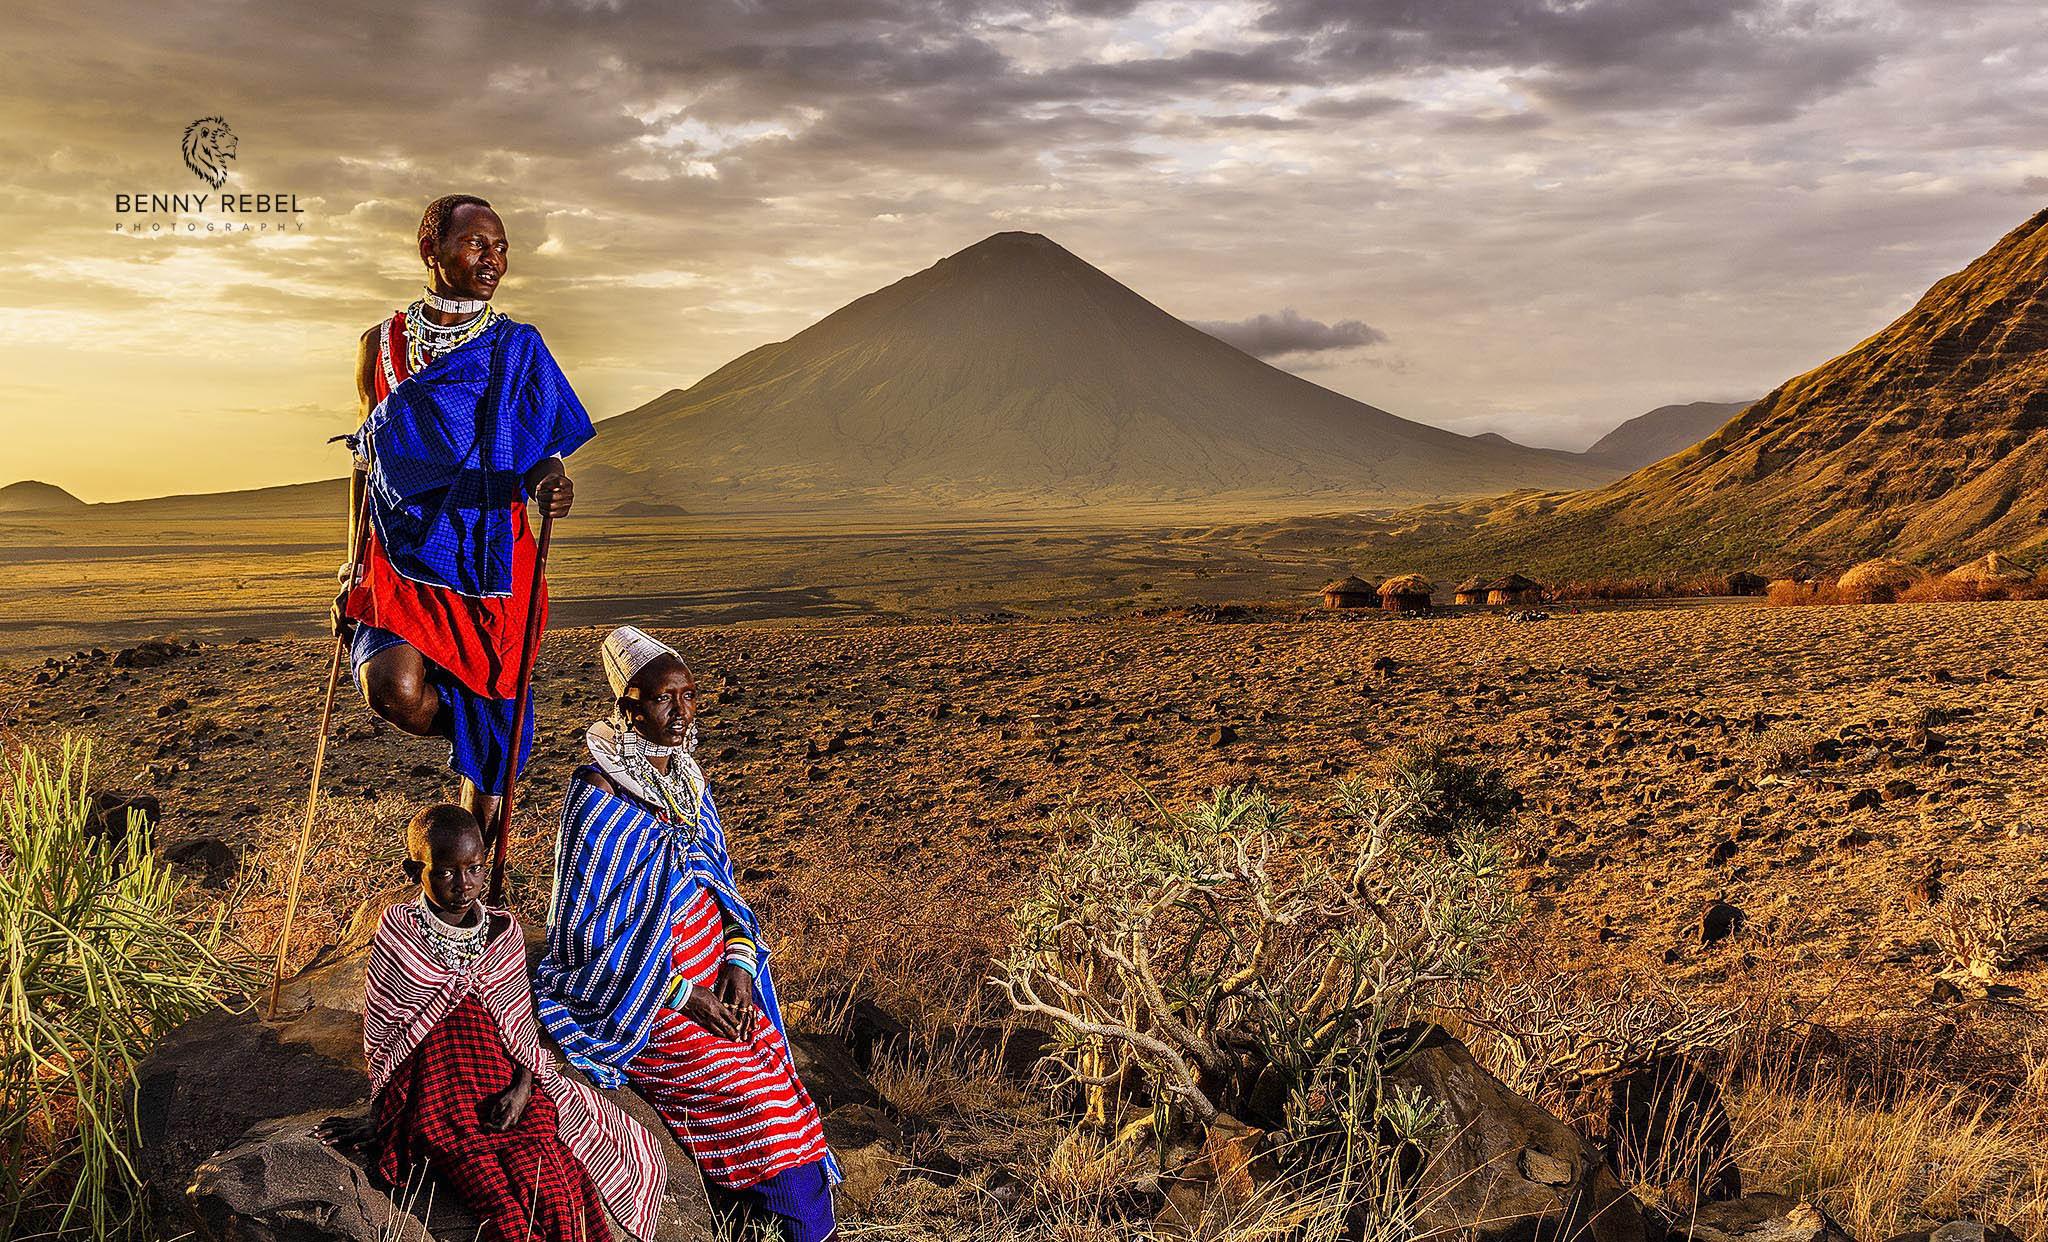 Fotoreise-Fotosafari-Afrika-Benny-Rebel-02